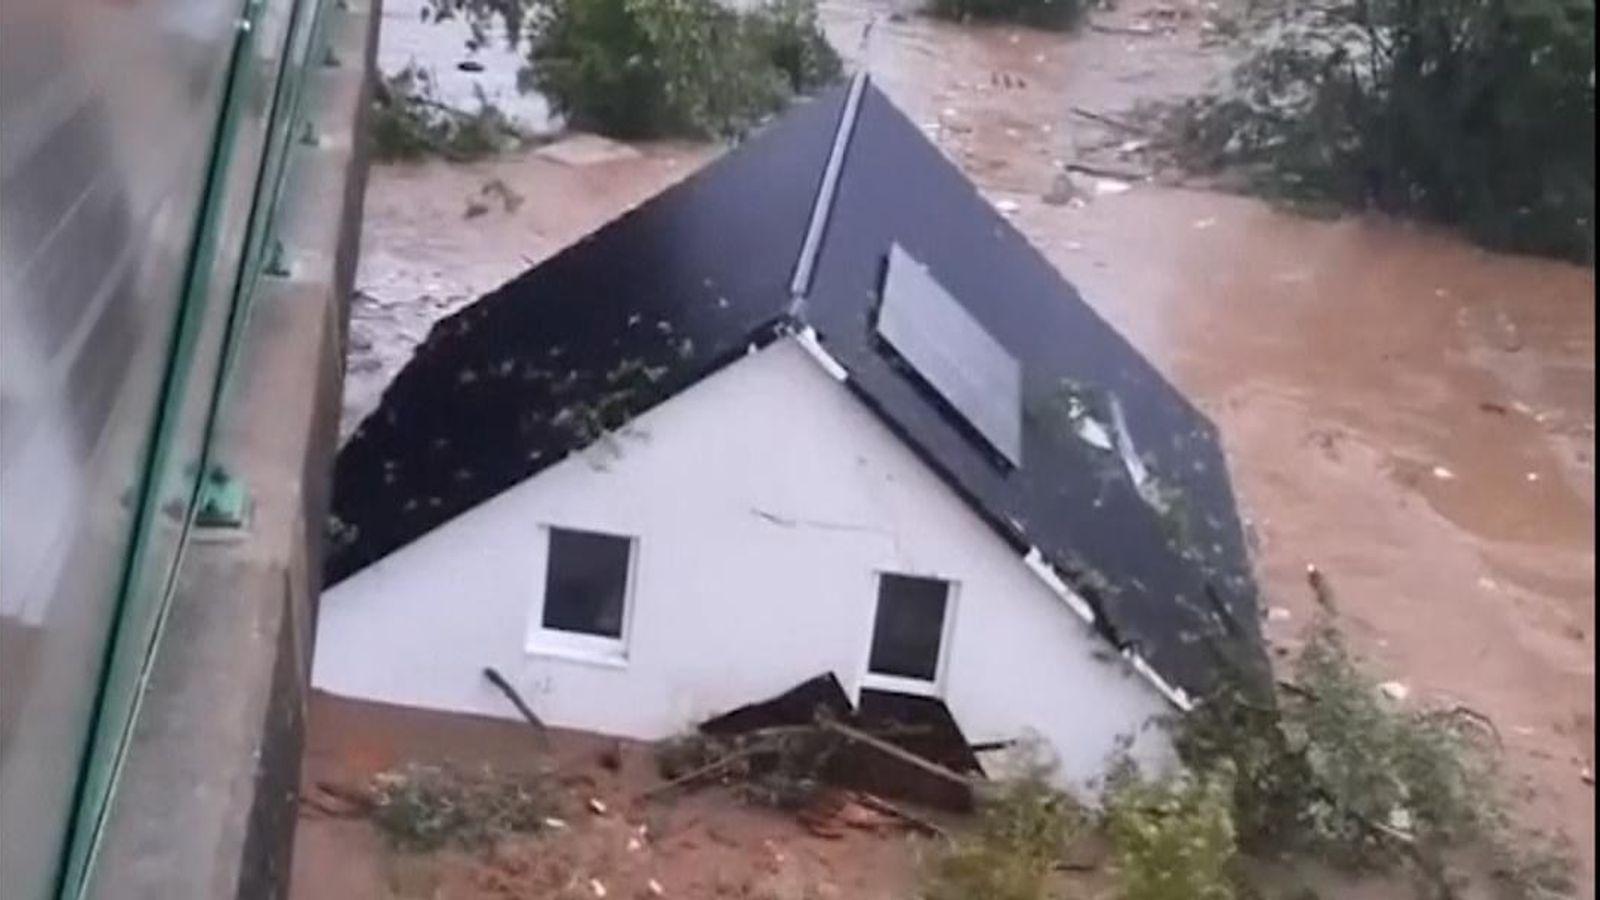 How 'inexplicable' floods have wreaked devastation across Europe